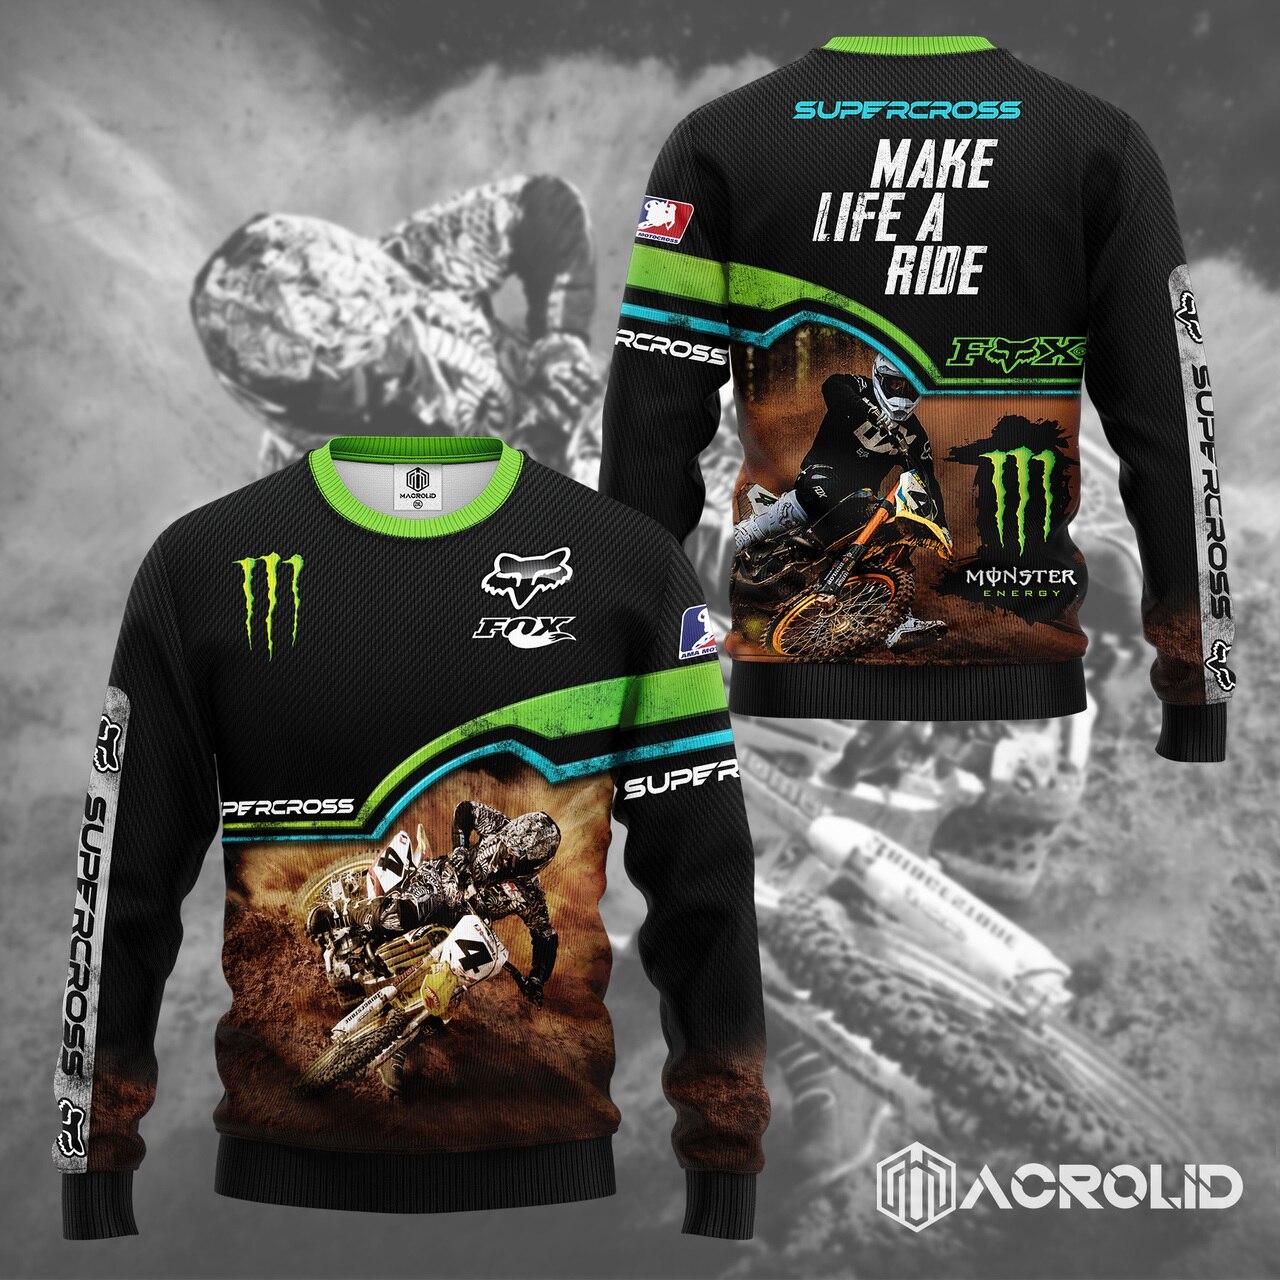 Fox racing monster energy make life a ride full printing sweatshirt